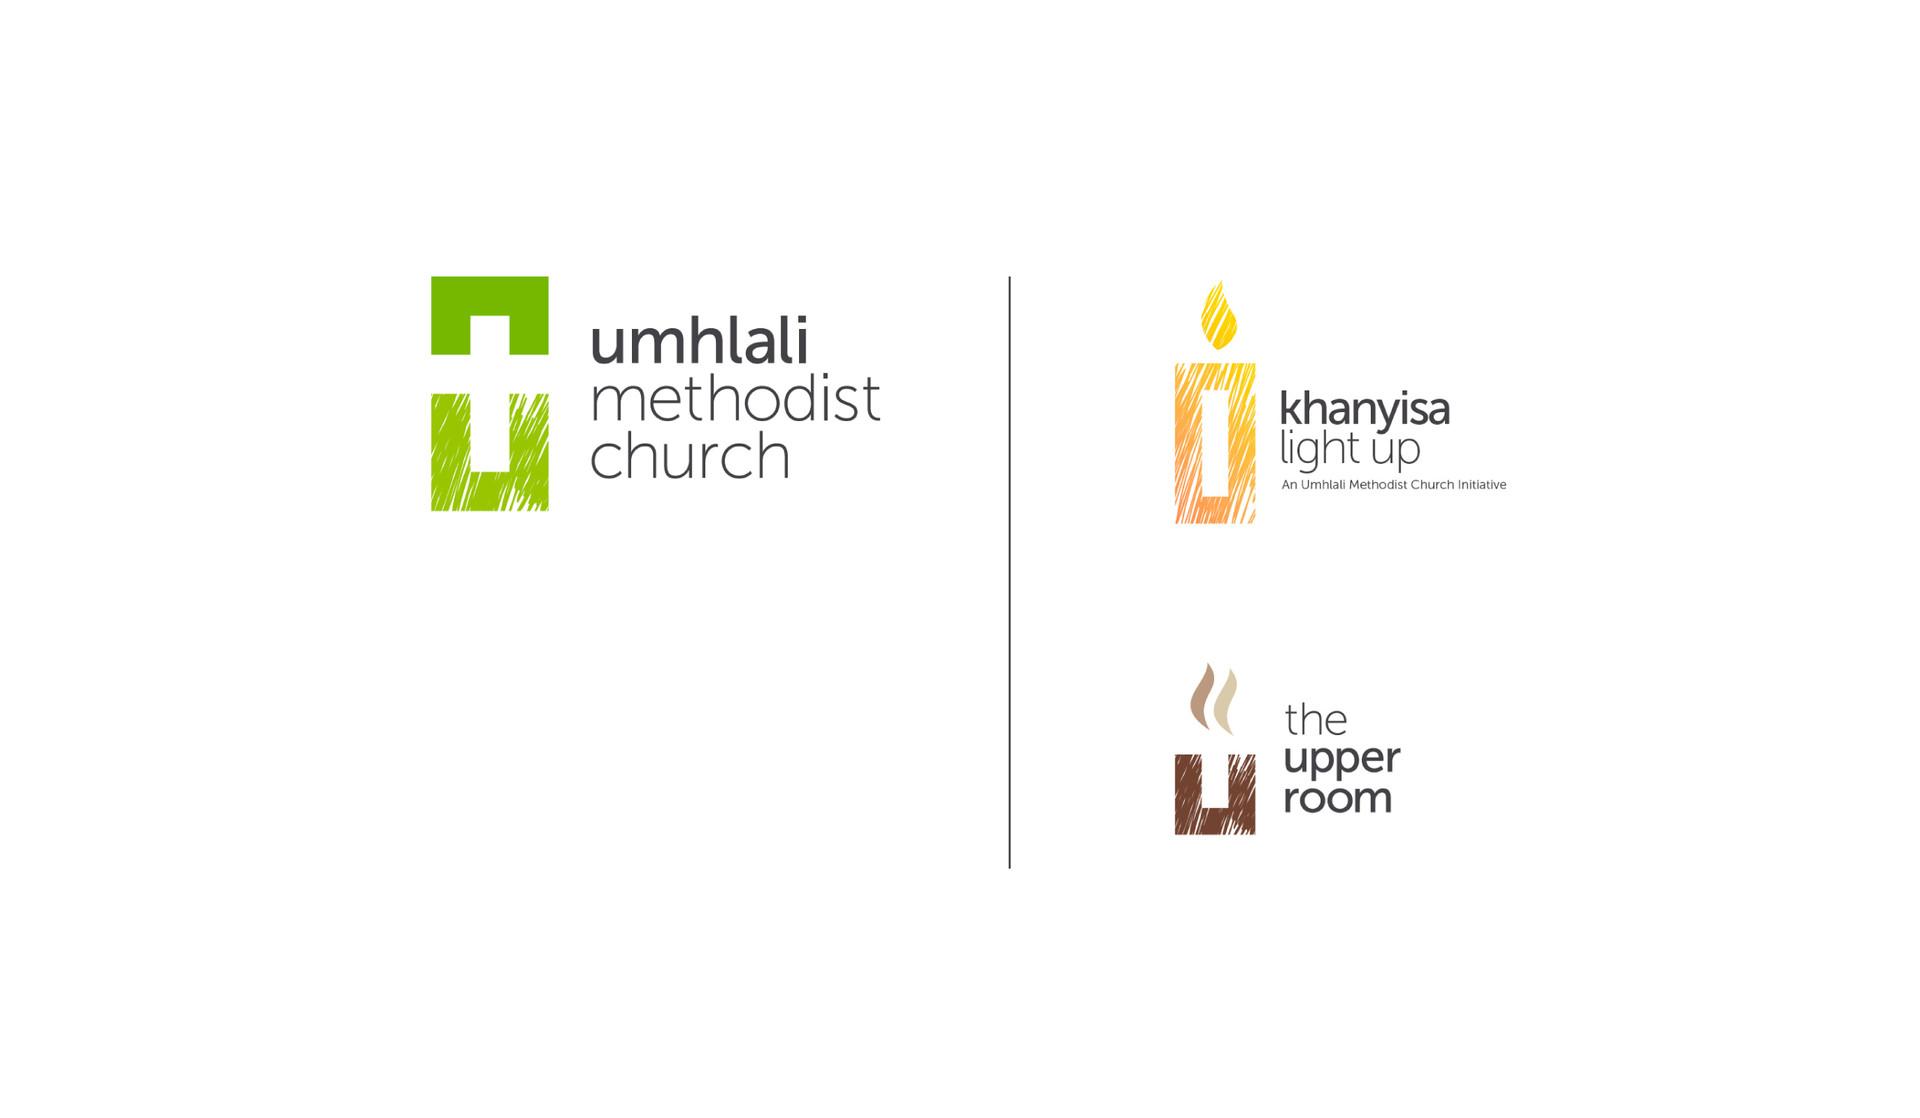 Umhlali-Methodist-Church-logo-design-02.